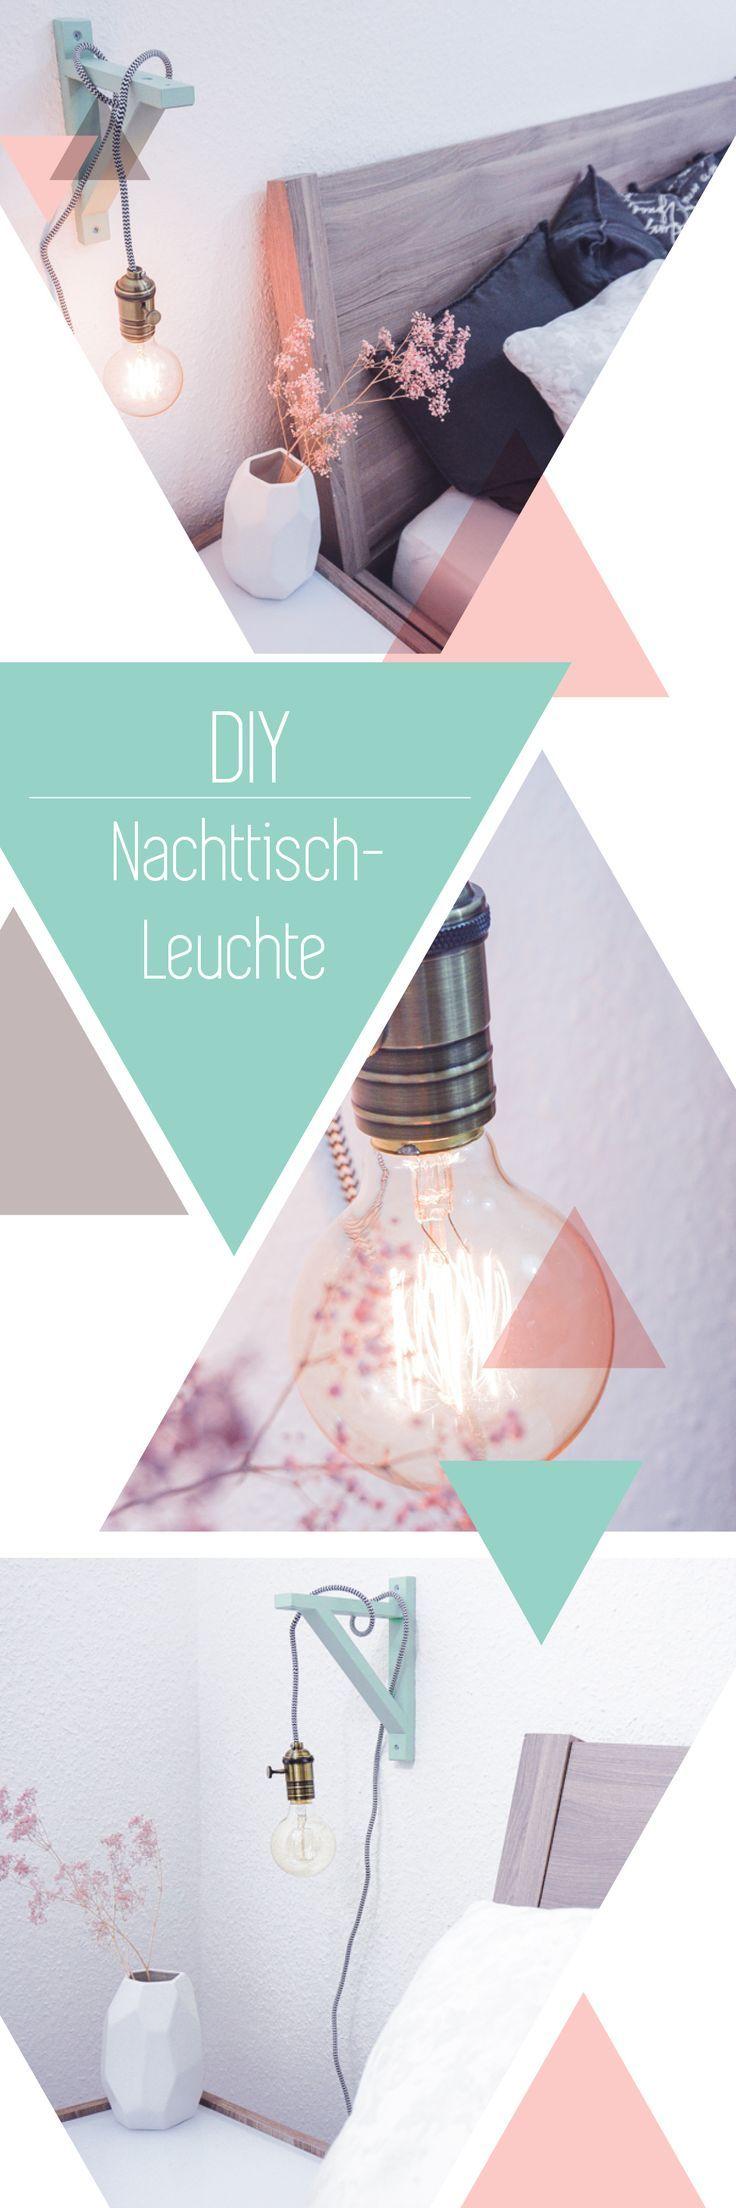 diy lampe mit holzrahmen textilkabel und gl hbirne sch nes licht im vintage stil inspiration. Black Bedroom Furniture Sets. Home Design Ideas